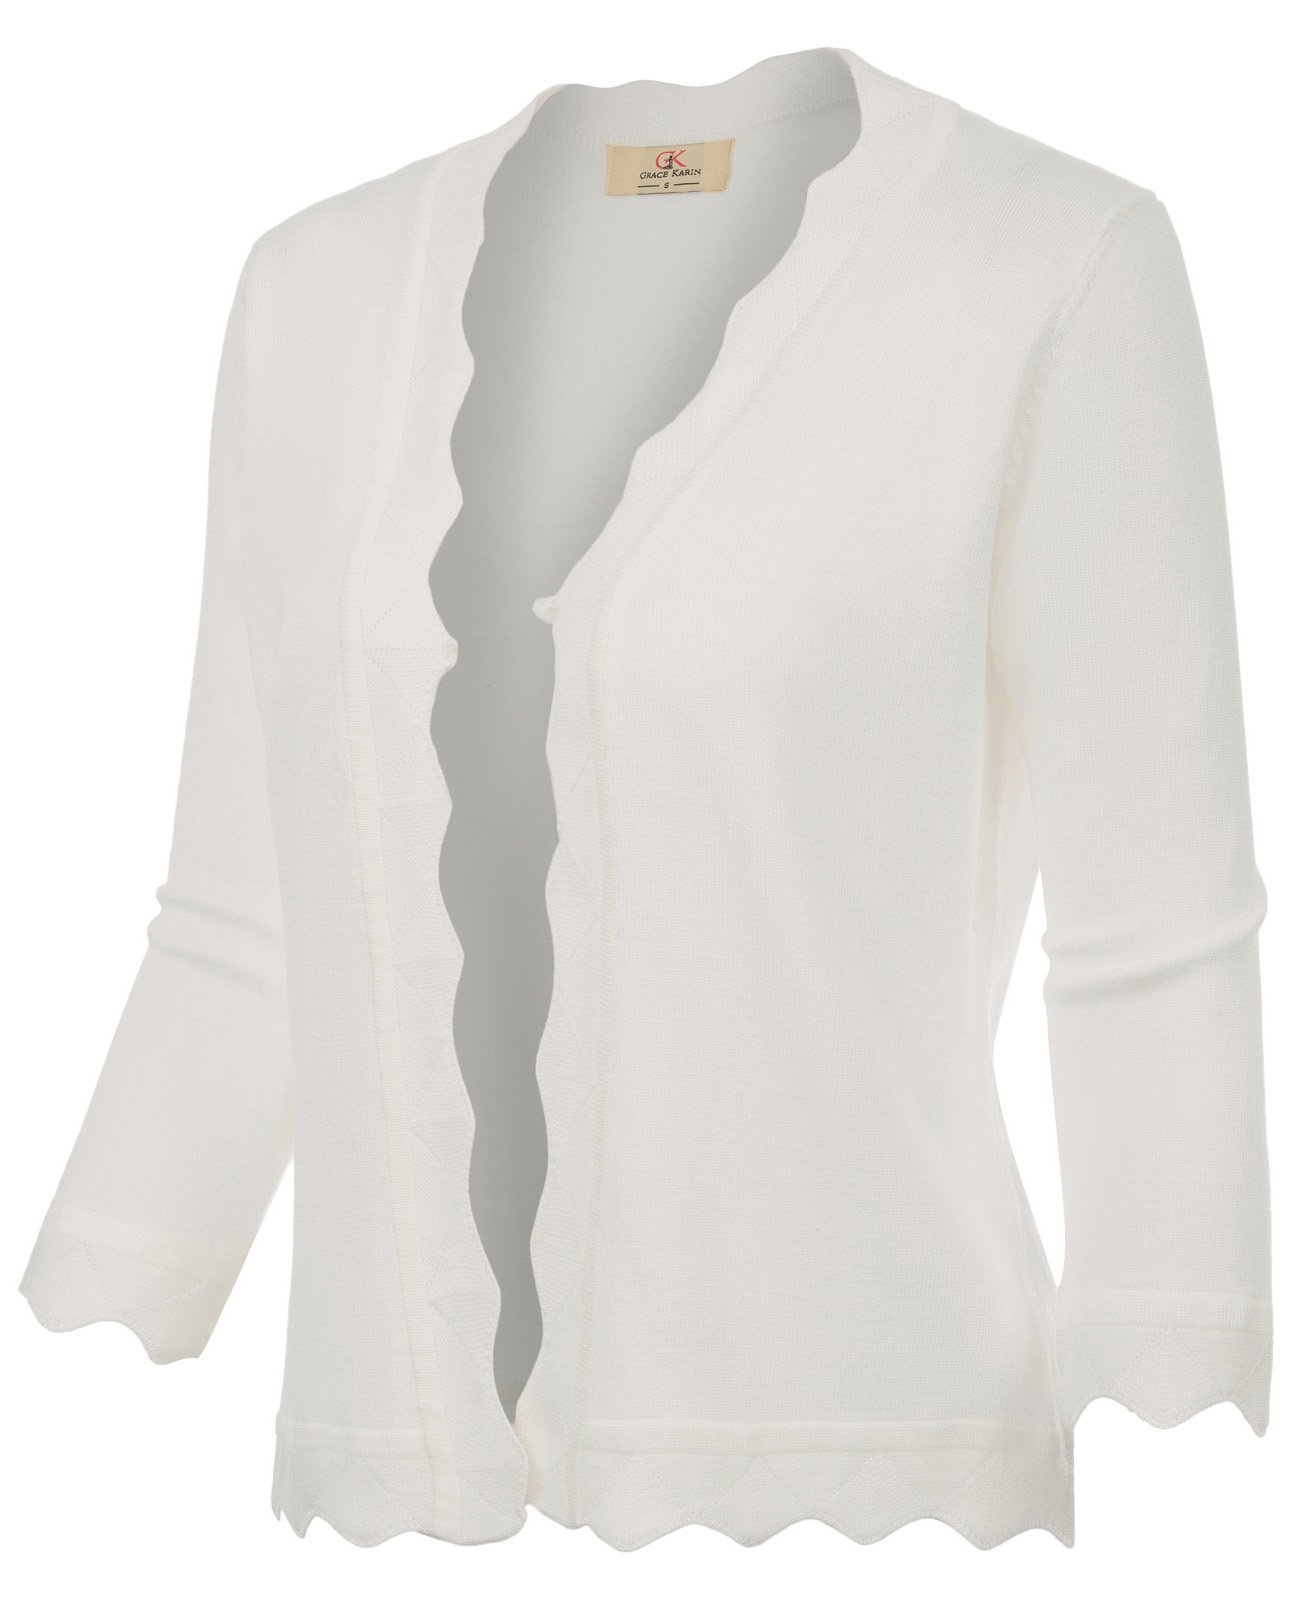 GRACE KARIN Office Cropped Knit Cardigan Jacket for Dress (XXL, Ivory 781)